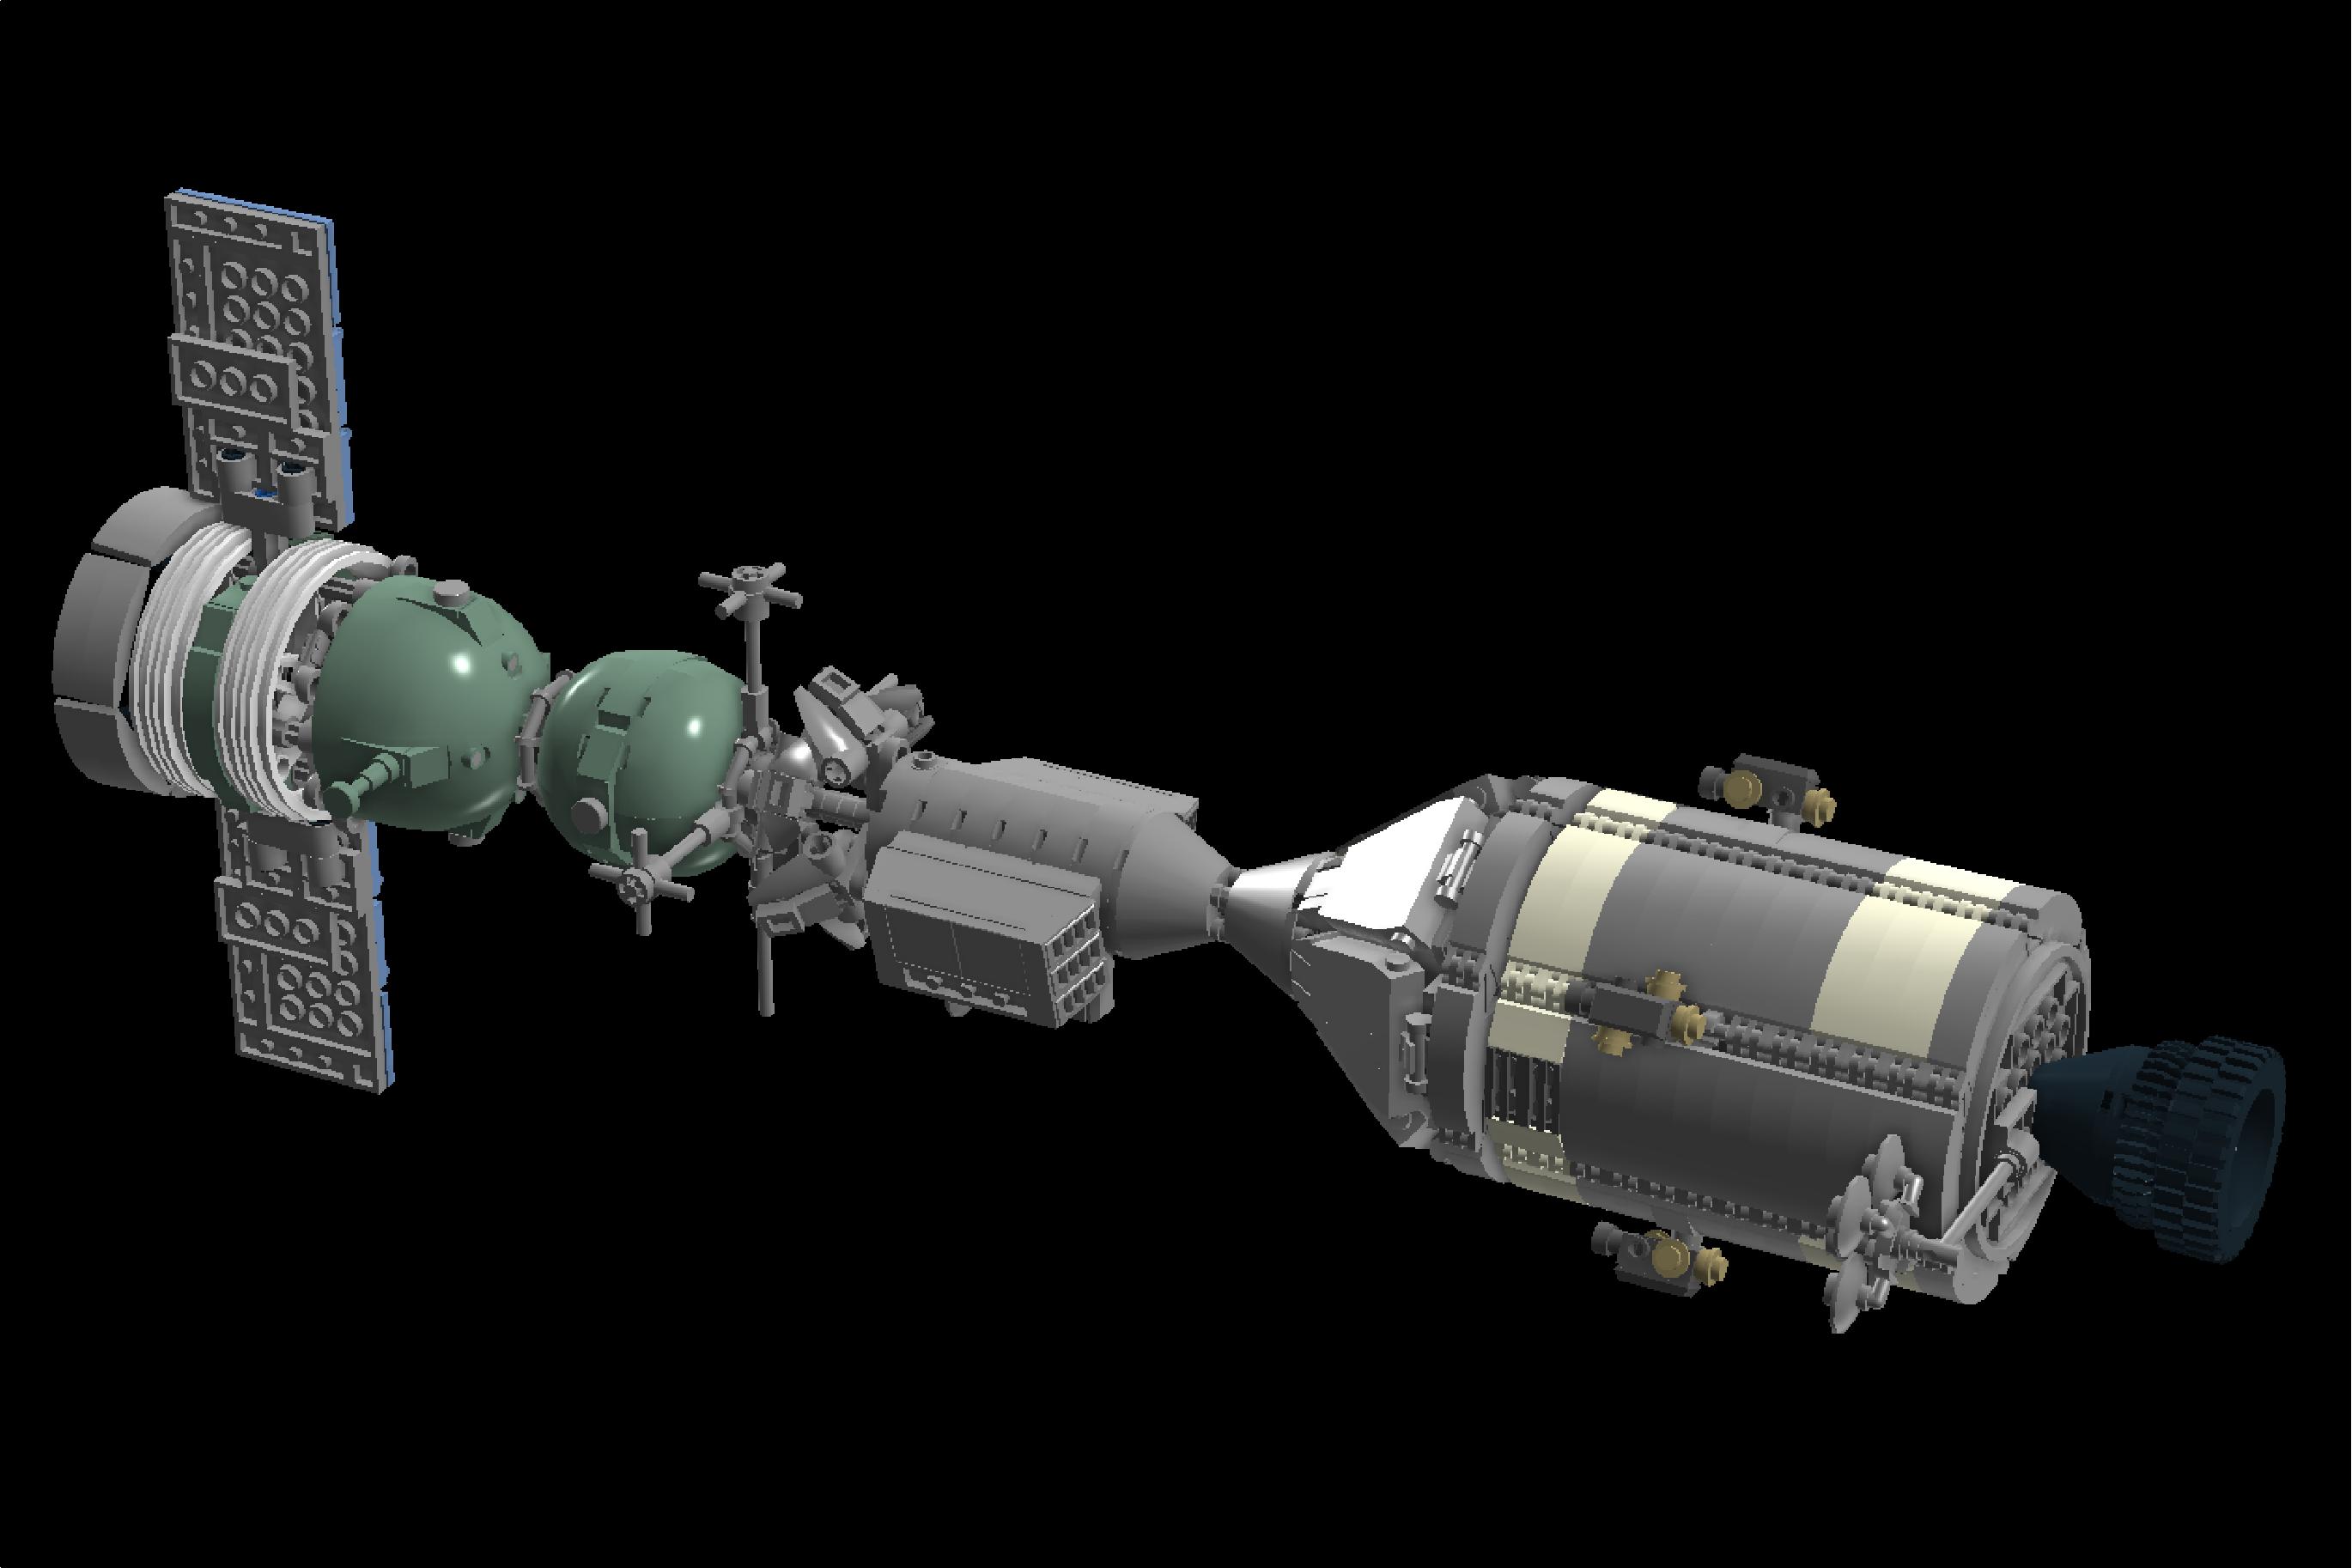 apollo spacecraft exploded - photo #15